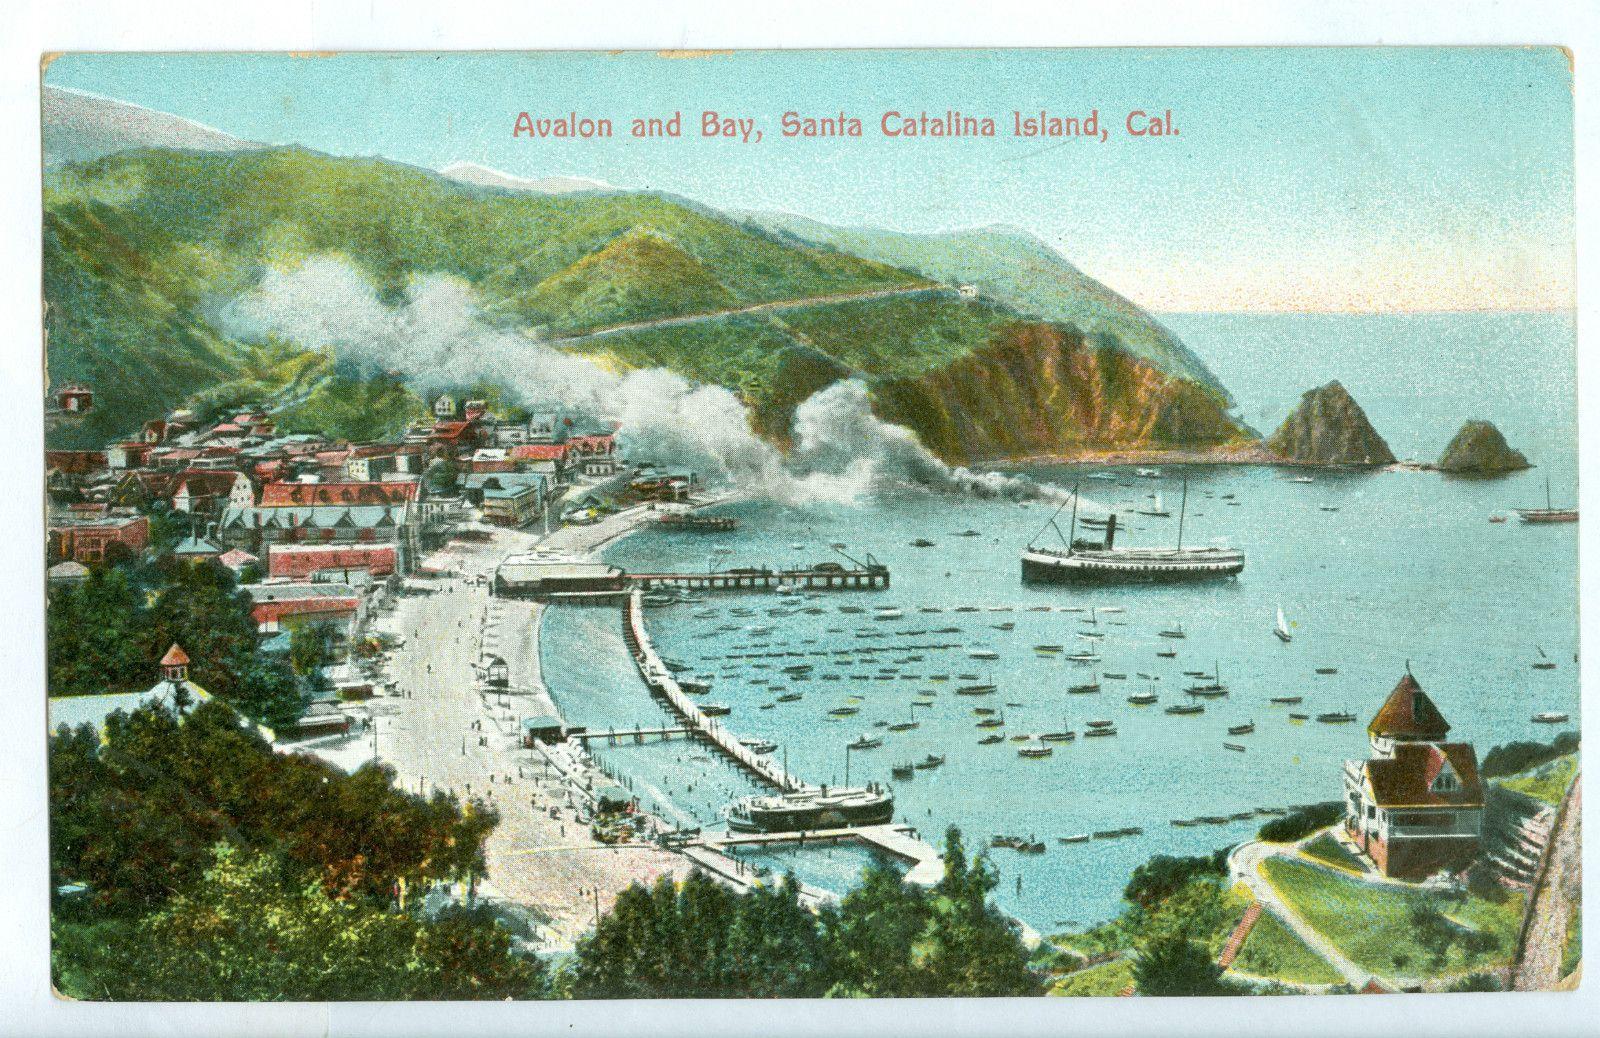 Pin On California Vintage Postcards Photos Books Videos Ephemera